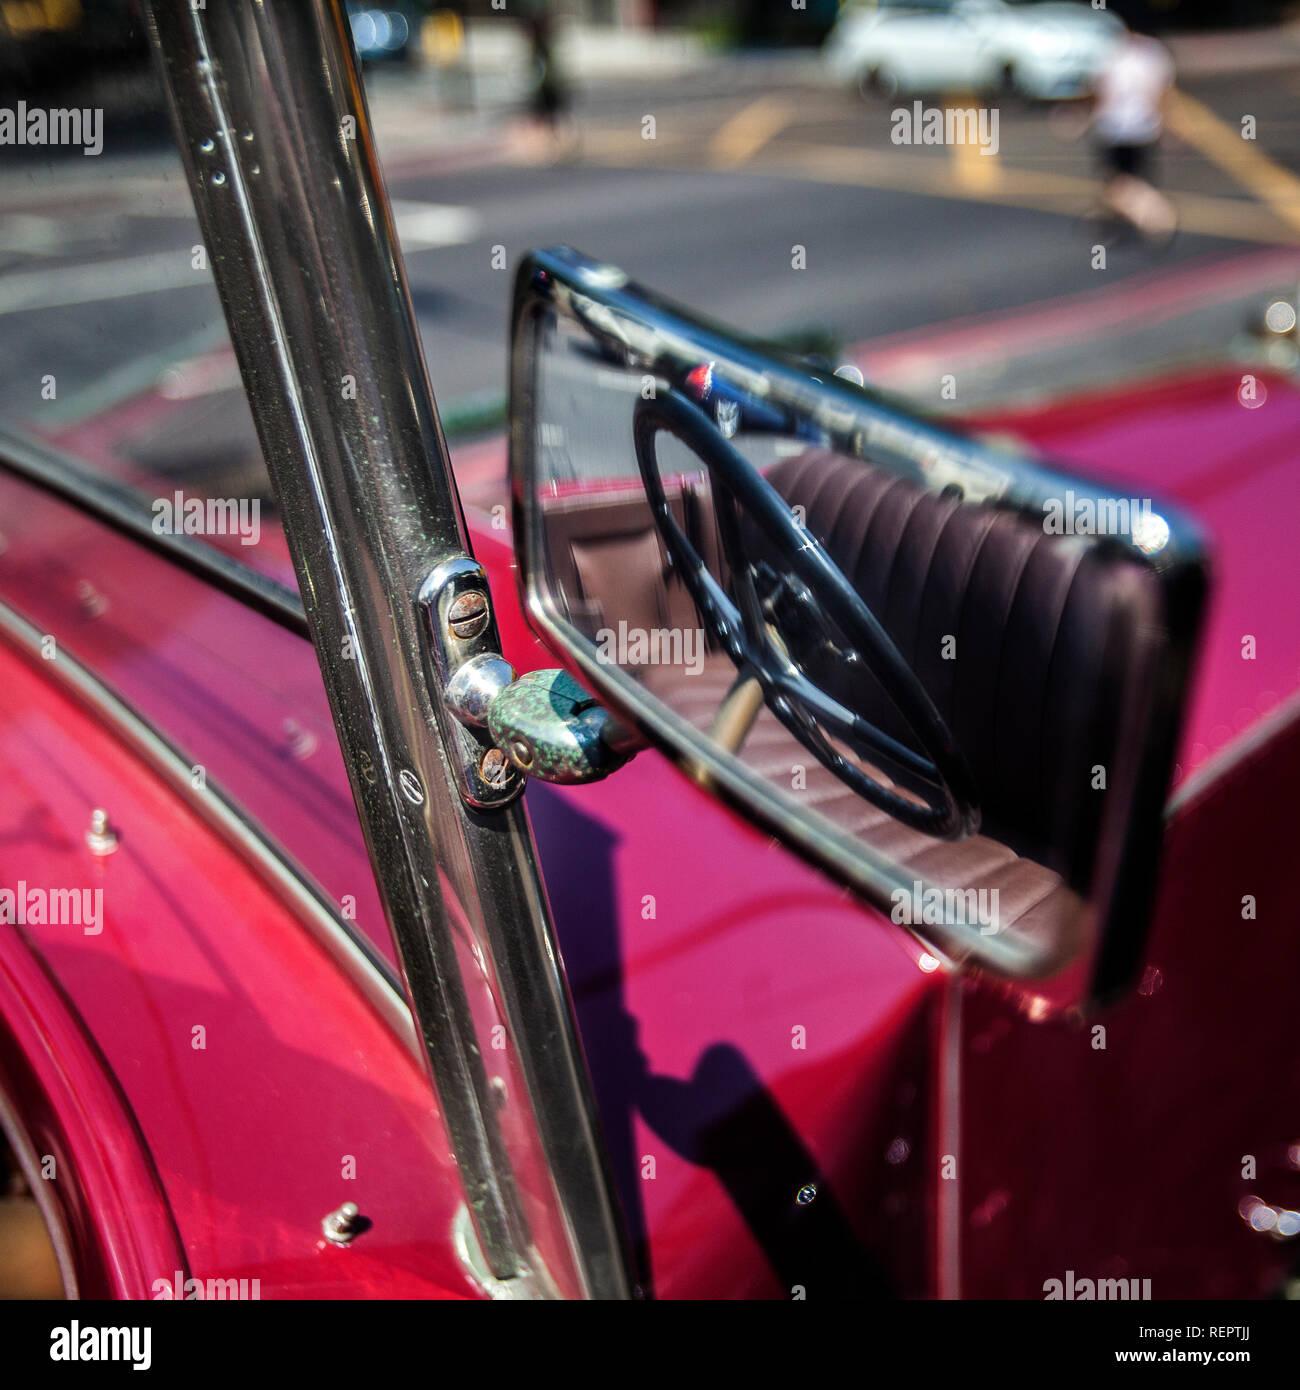 Rolls Royce classic phantom 1934 car - Stock Image